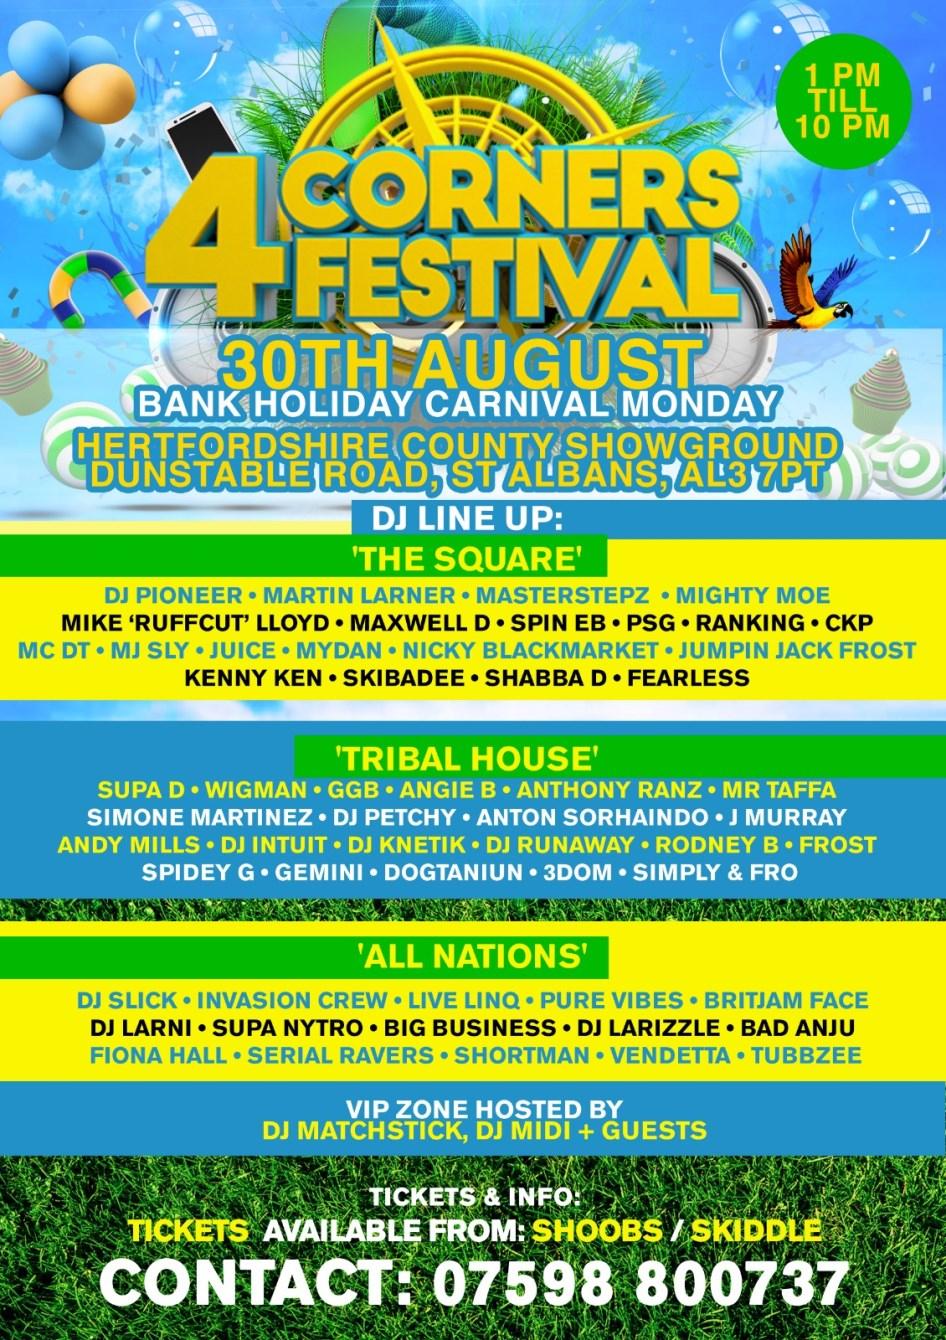 4corners Festival - Flyer back